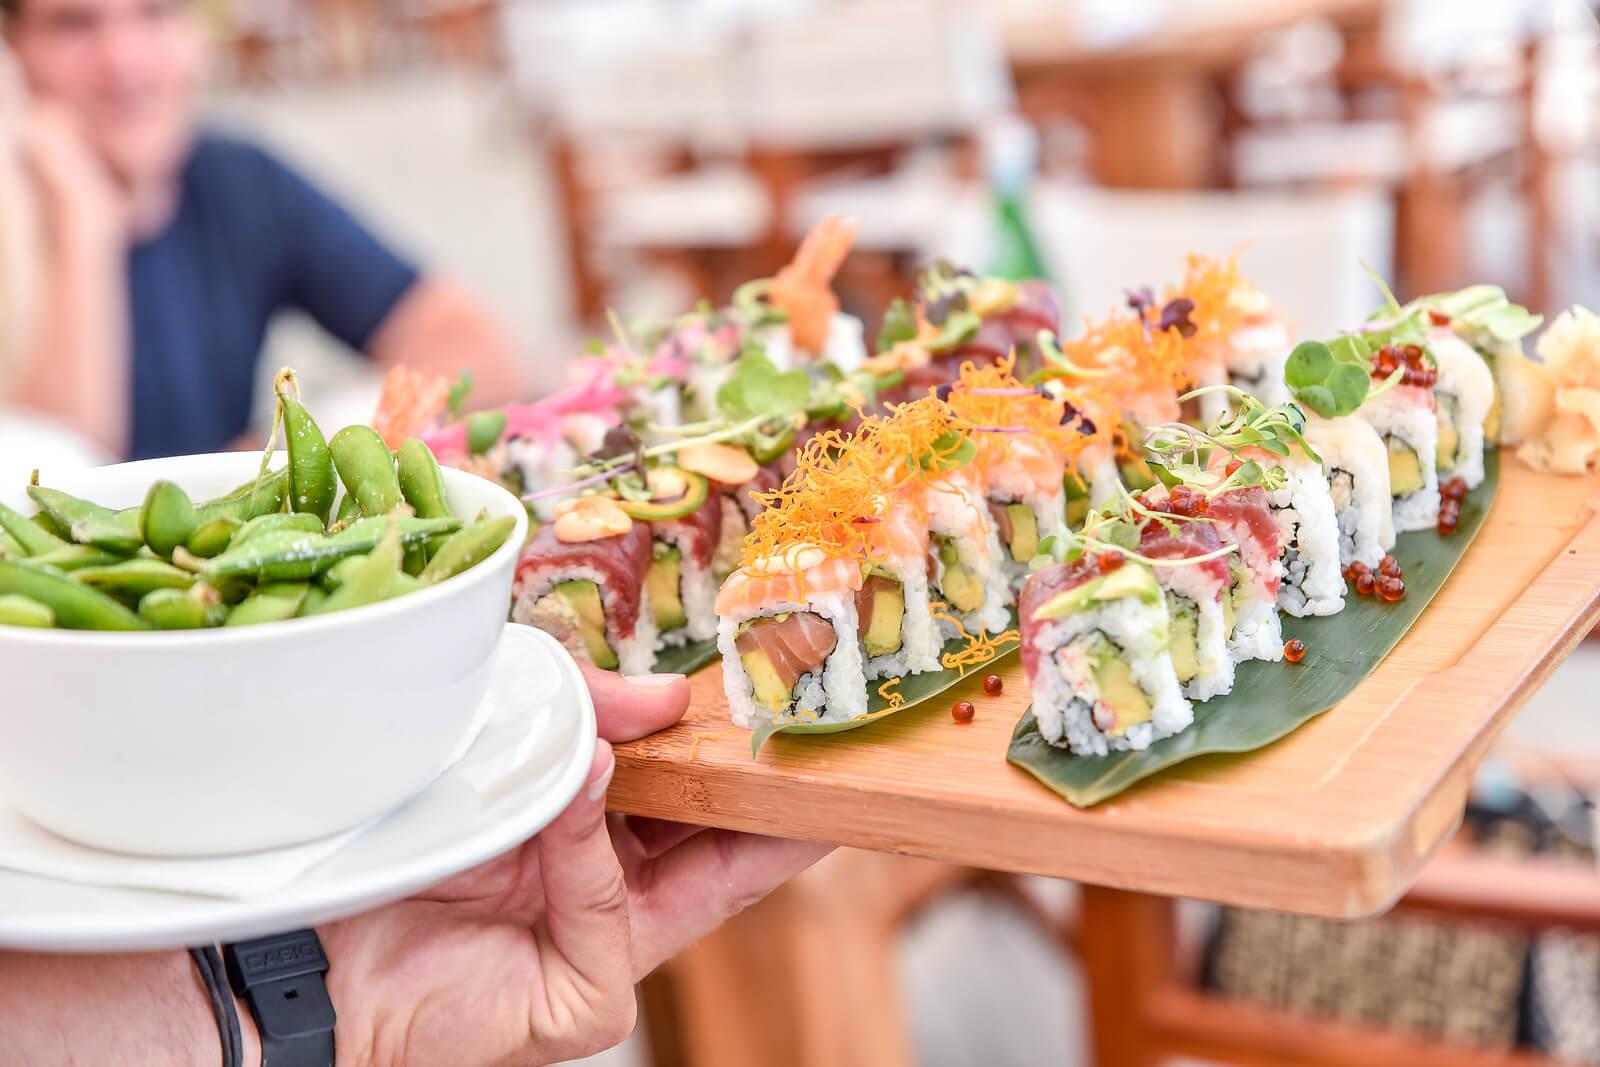 https://www.white-ibiza.com/wp-content/uploads/2020/03/white-ibiza-restaurants-nikki-beach-ibiza-2020-13.jpg